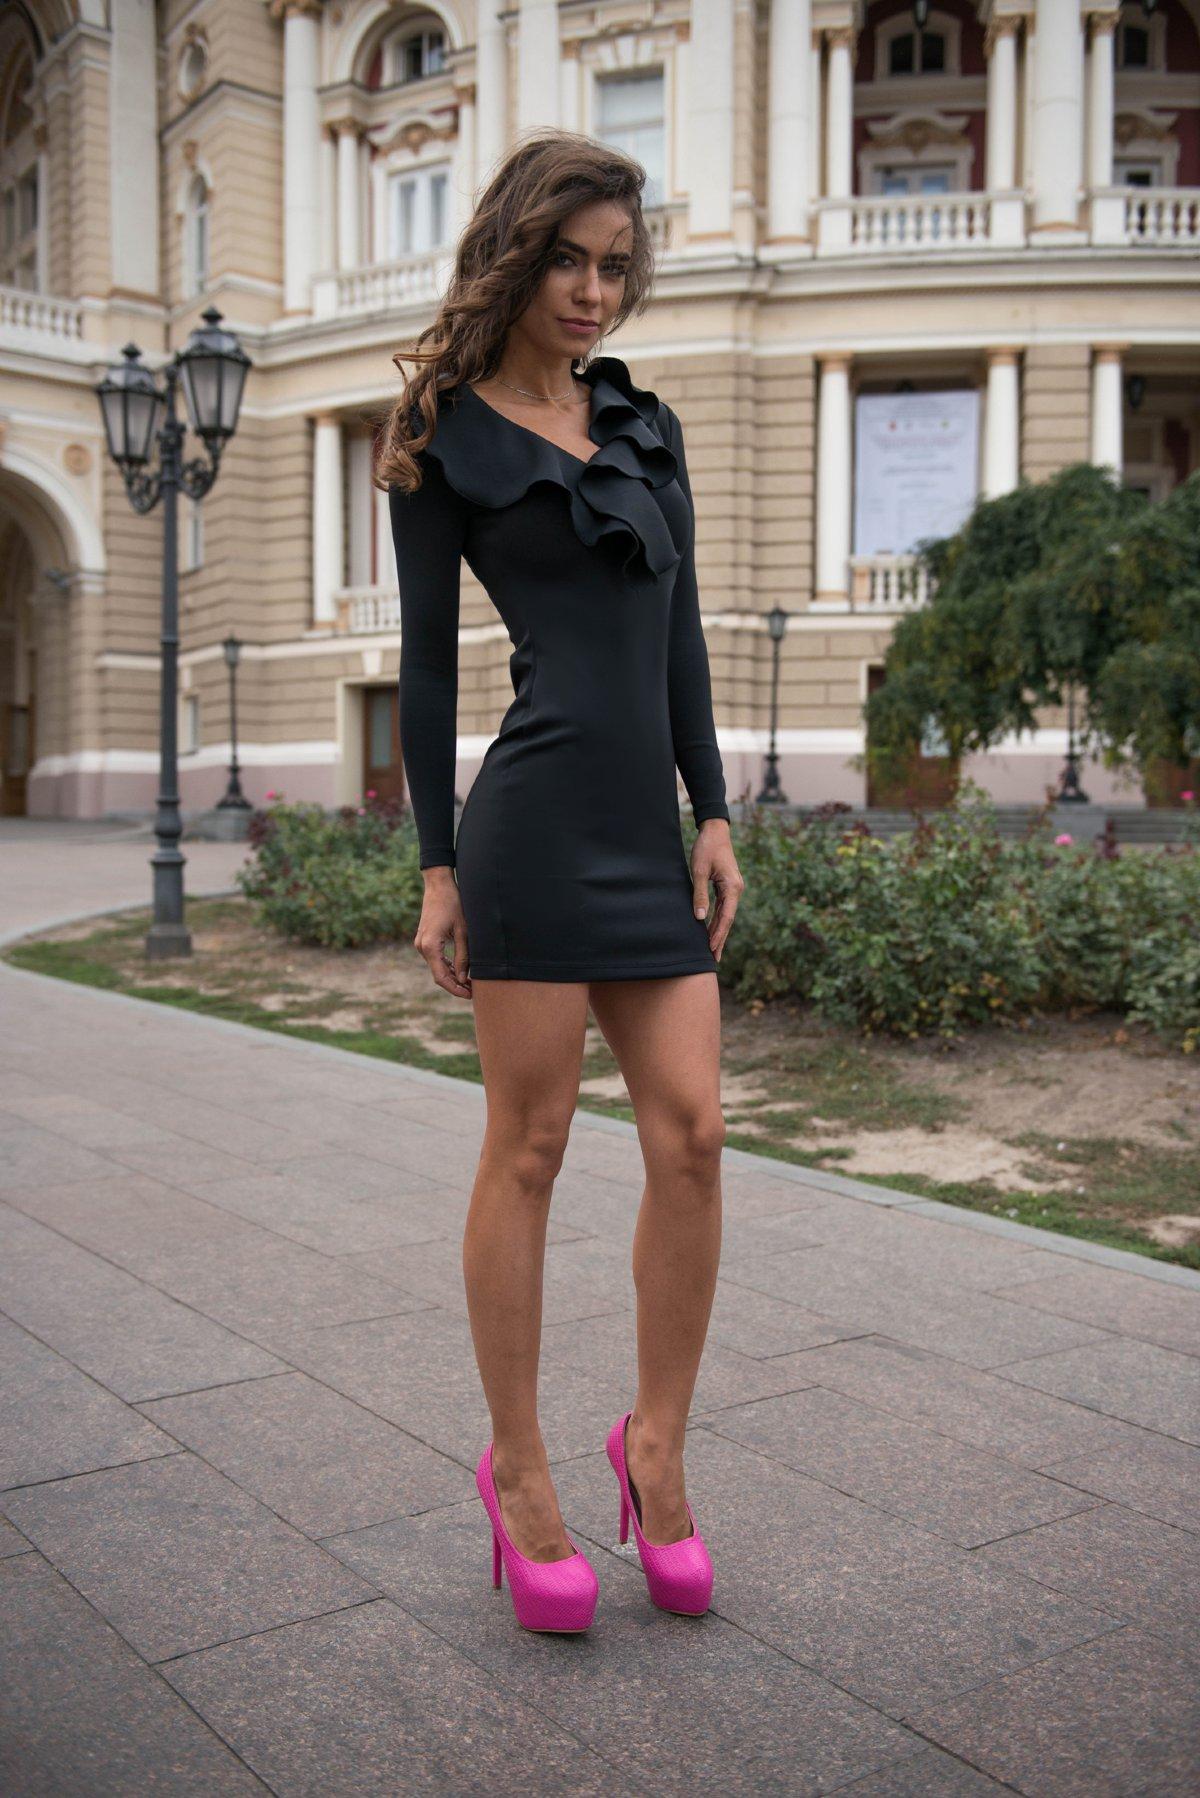 Раком в мини платье фото фото 669-38